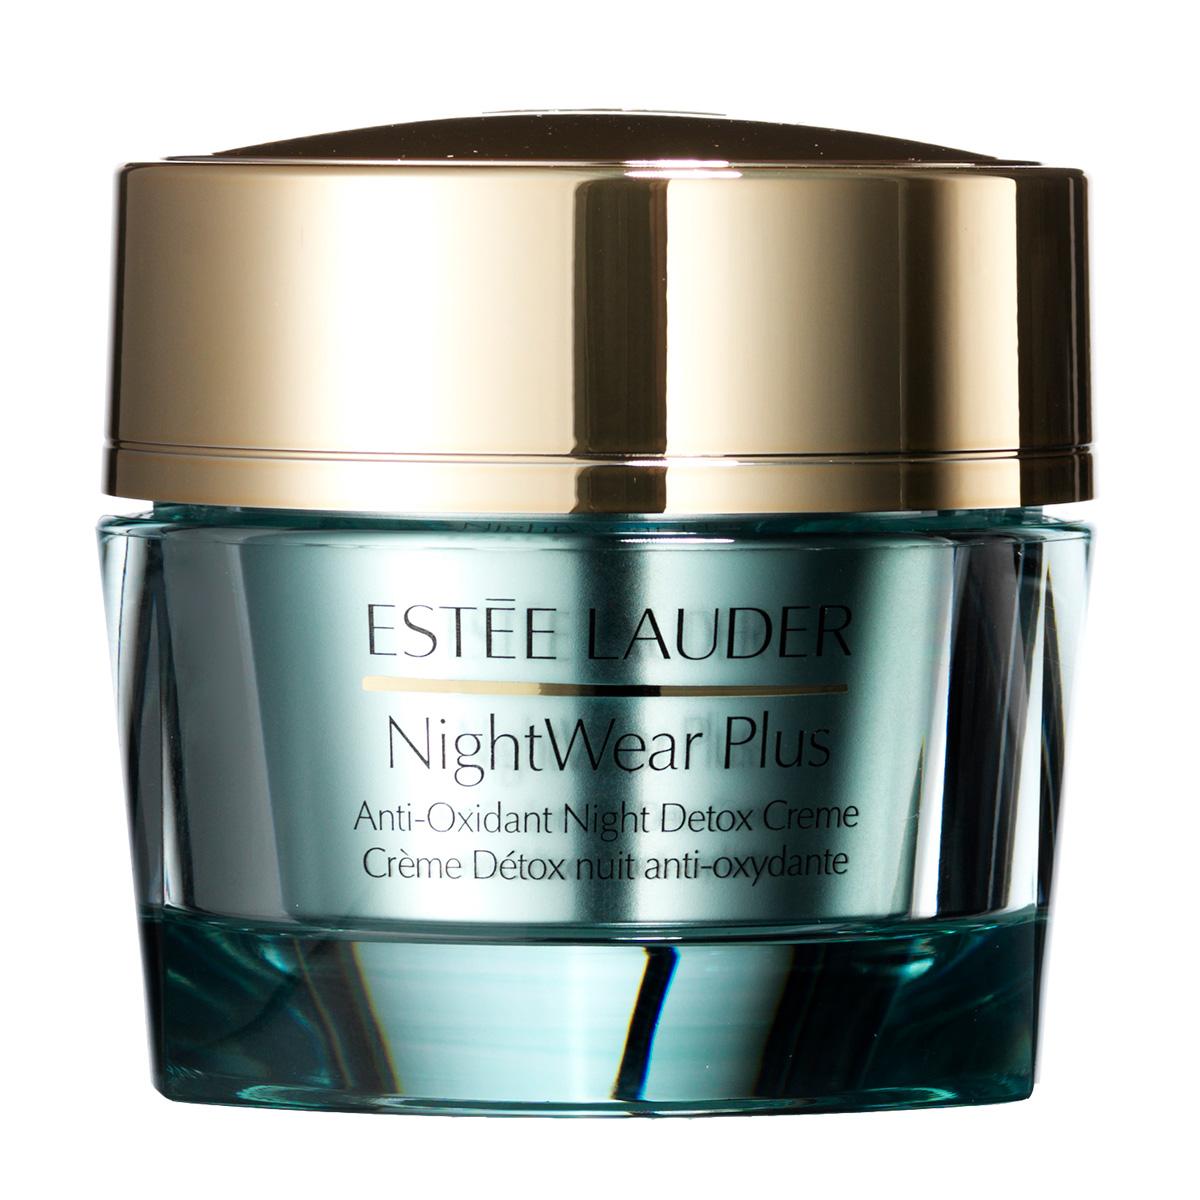 Billede af Estée Lauder NightWear Plus Anti-Oxidant Night Detox Creme - 50 ml